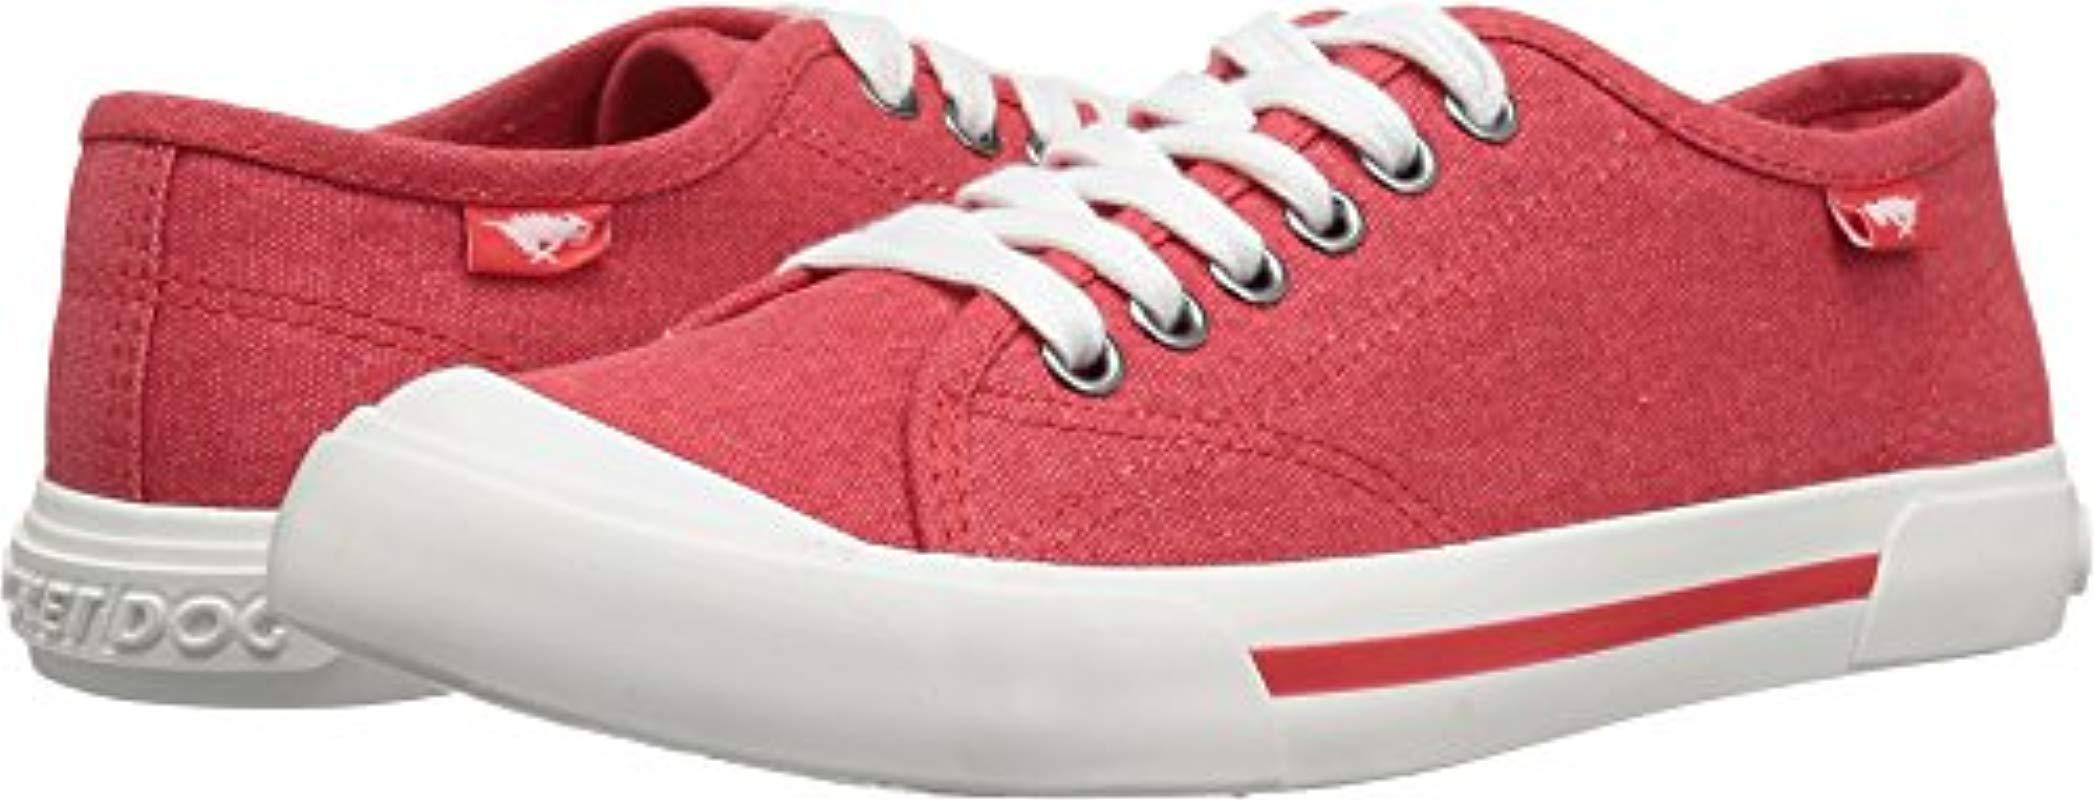 c0b73f41b827cc Lyst - Rocket Dog Jumpin Weekend Canvas Fashion Sneaker in Red